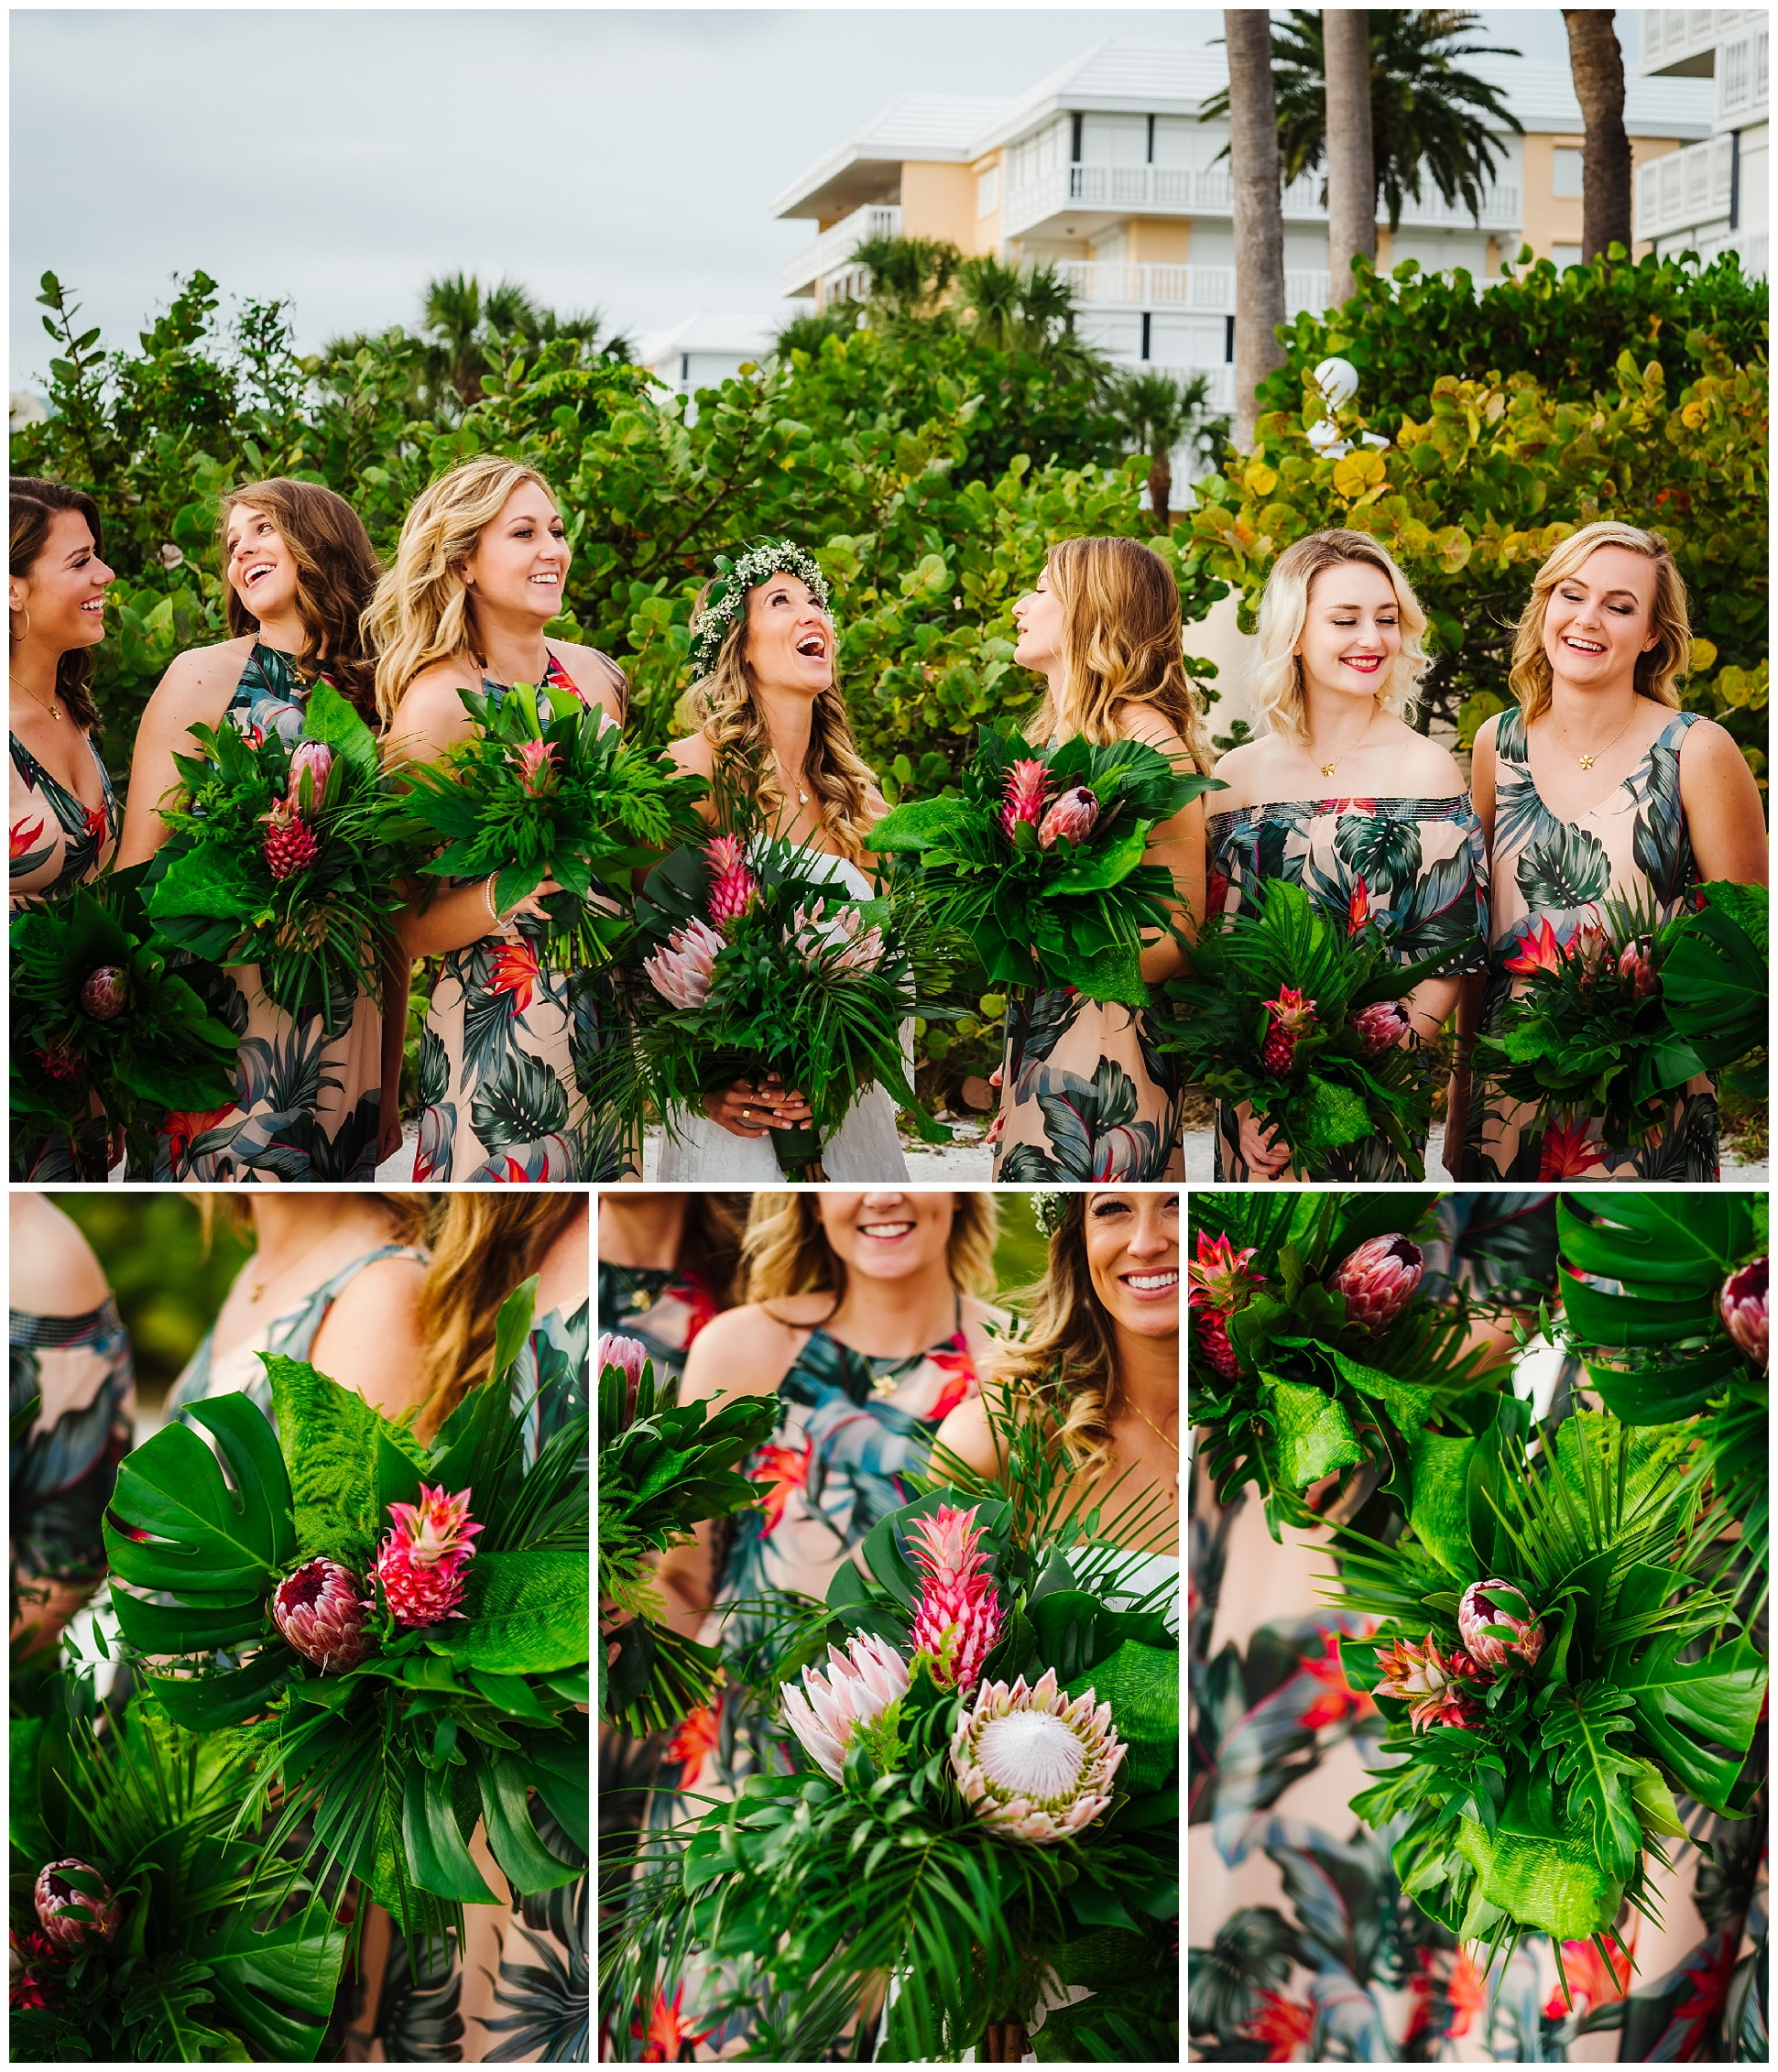 tampa-bay-wedding-photographer-barefoot-post-card-inn-tropical-hawaiin-lei-pink-pineapples-flower-crown_0151.jpg